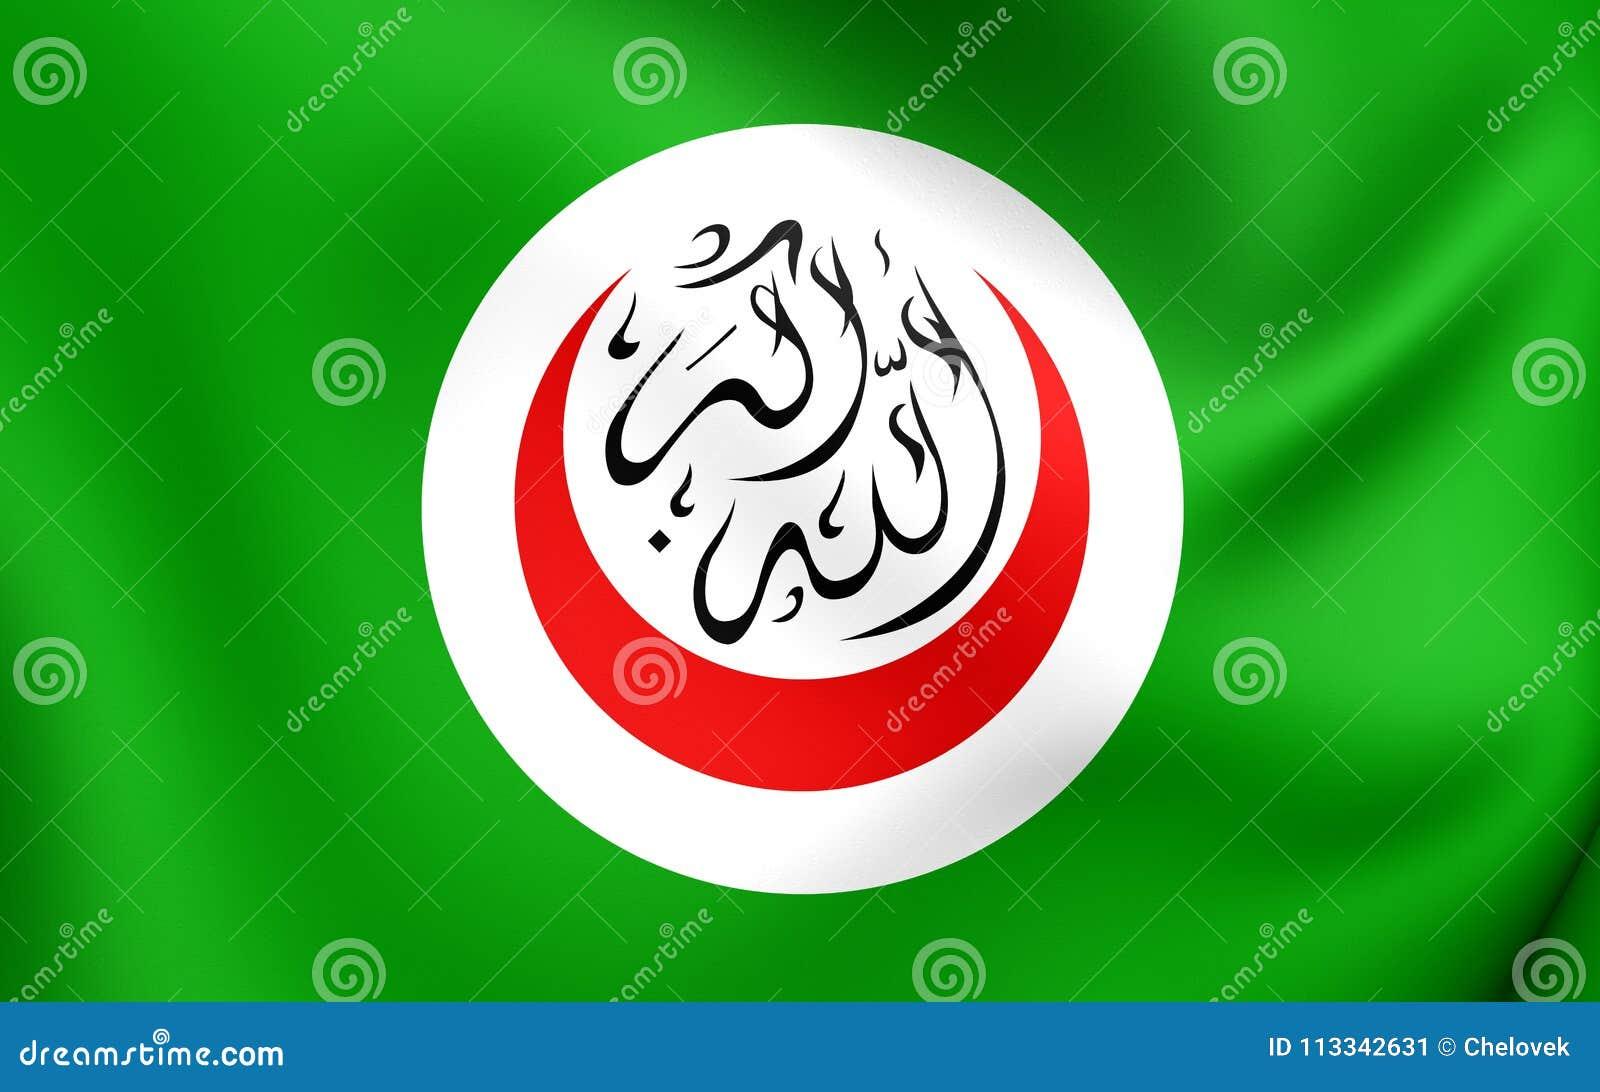 Организация исламского флага сотрудничества